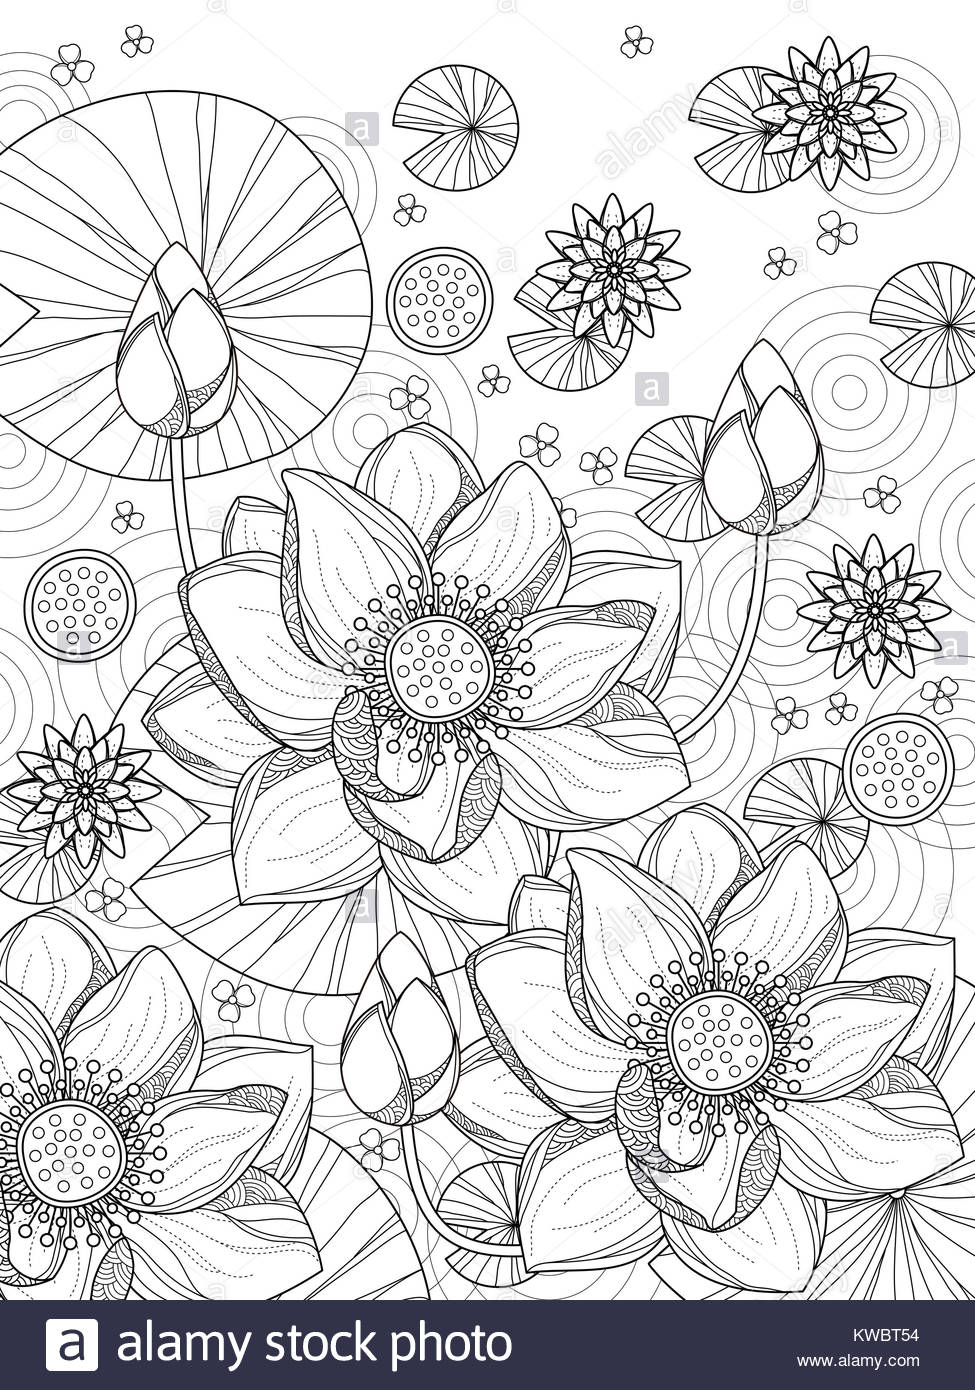 Lotus Flower Decoration Monochrome Stockfotos & Lotus Flower ...